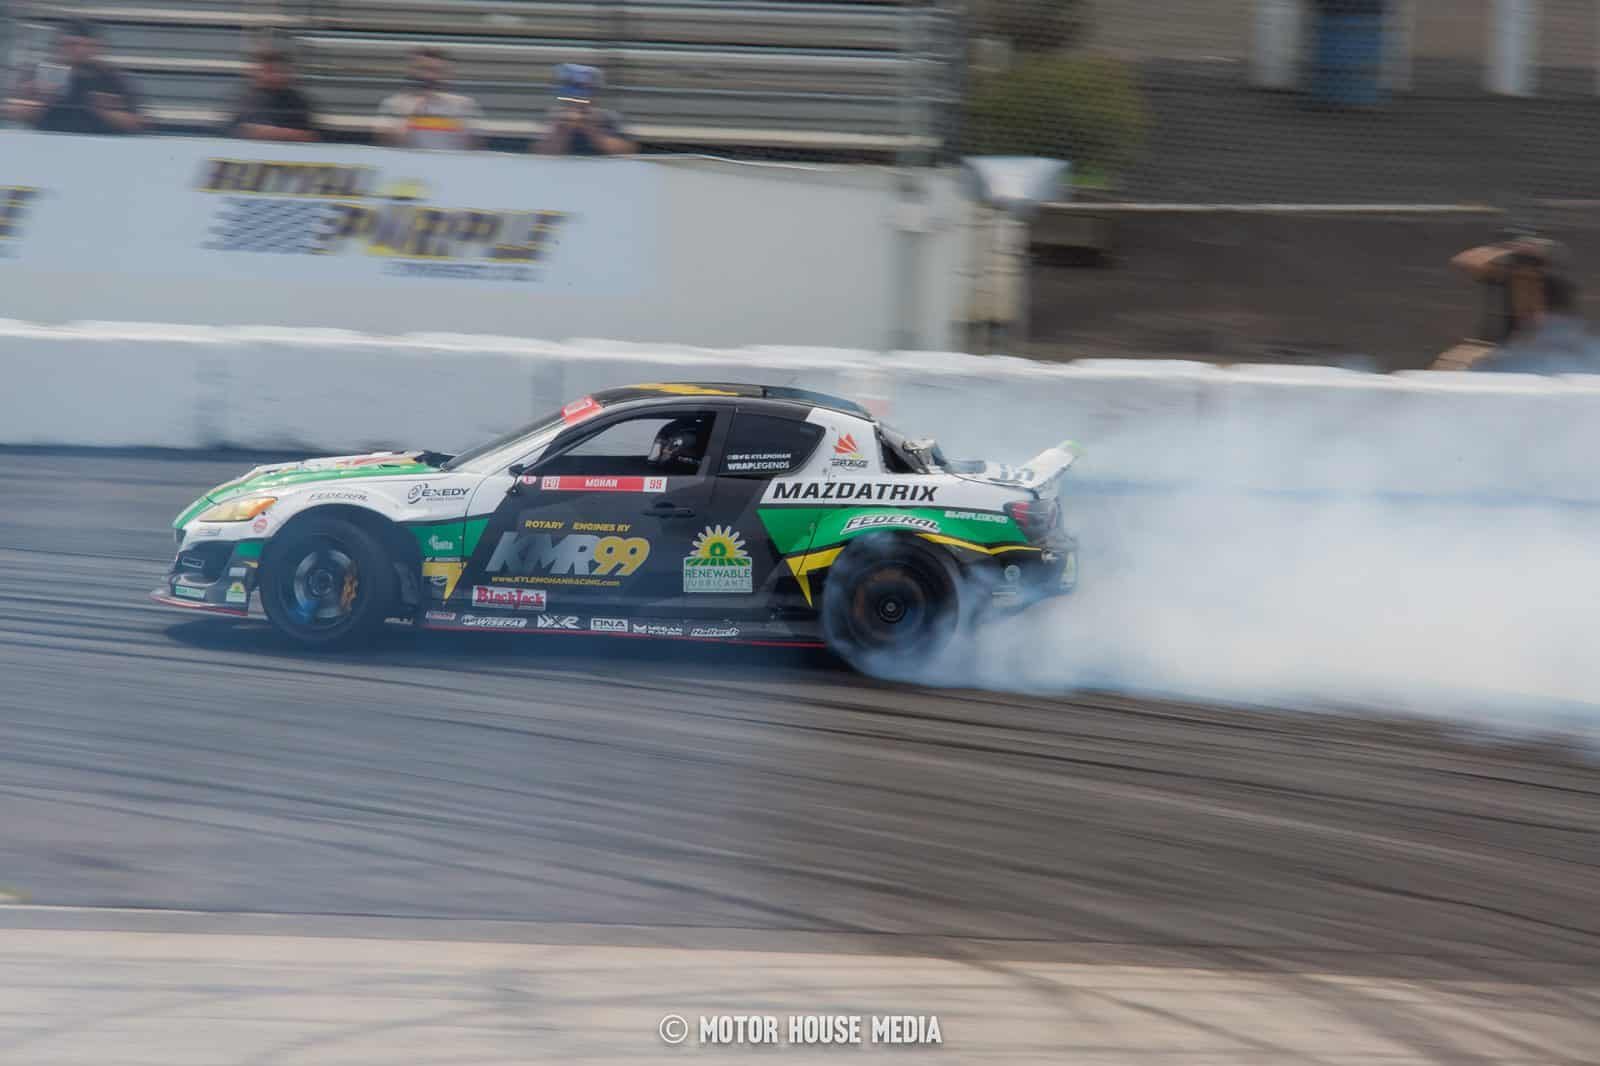 Kyle Mohan in his Mazda drift car